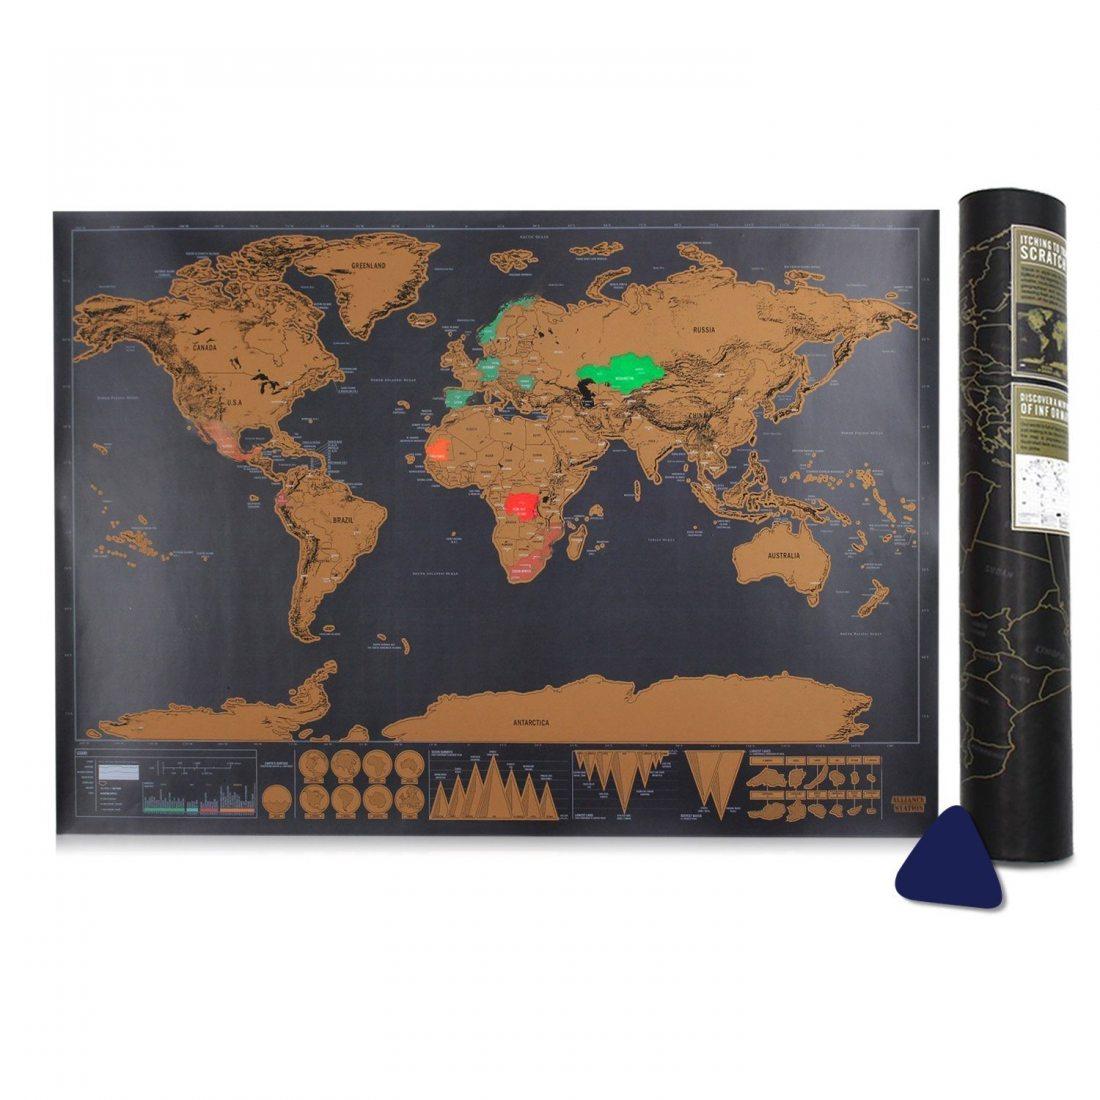 carte du monde samione scratch le monde carte du monde gratter scrape off world map grattez. Black Bedroom Furniture Sets. Home Design Ideas